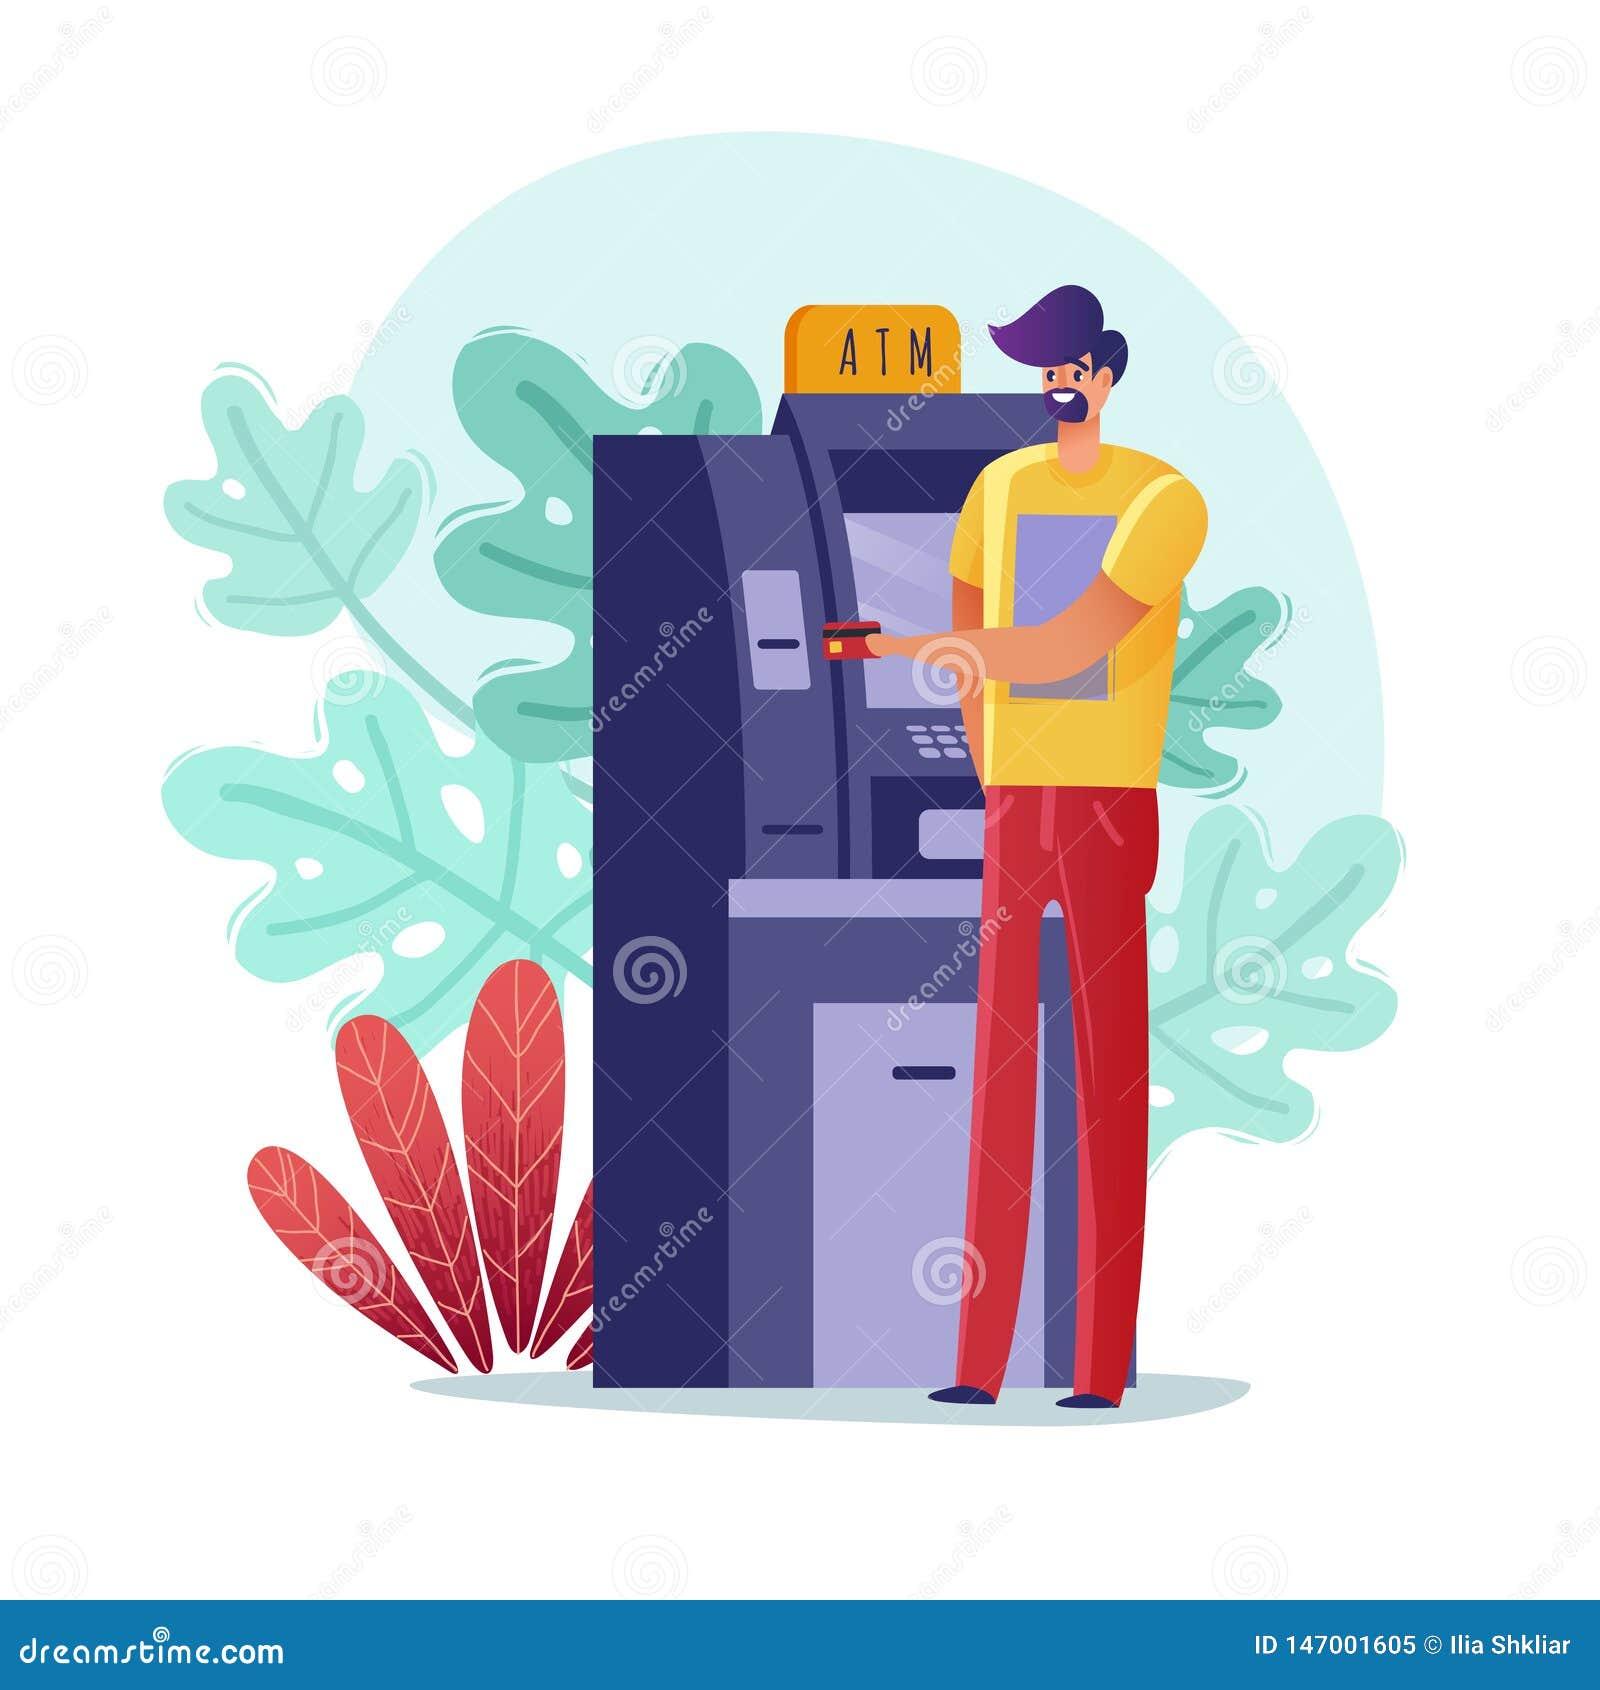 ATM paymens人例证